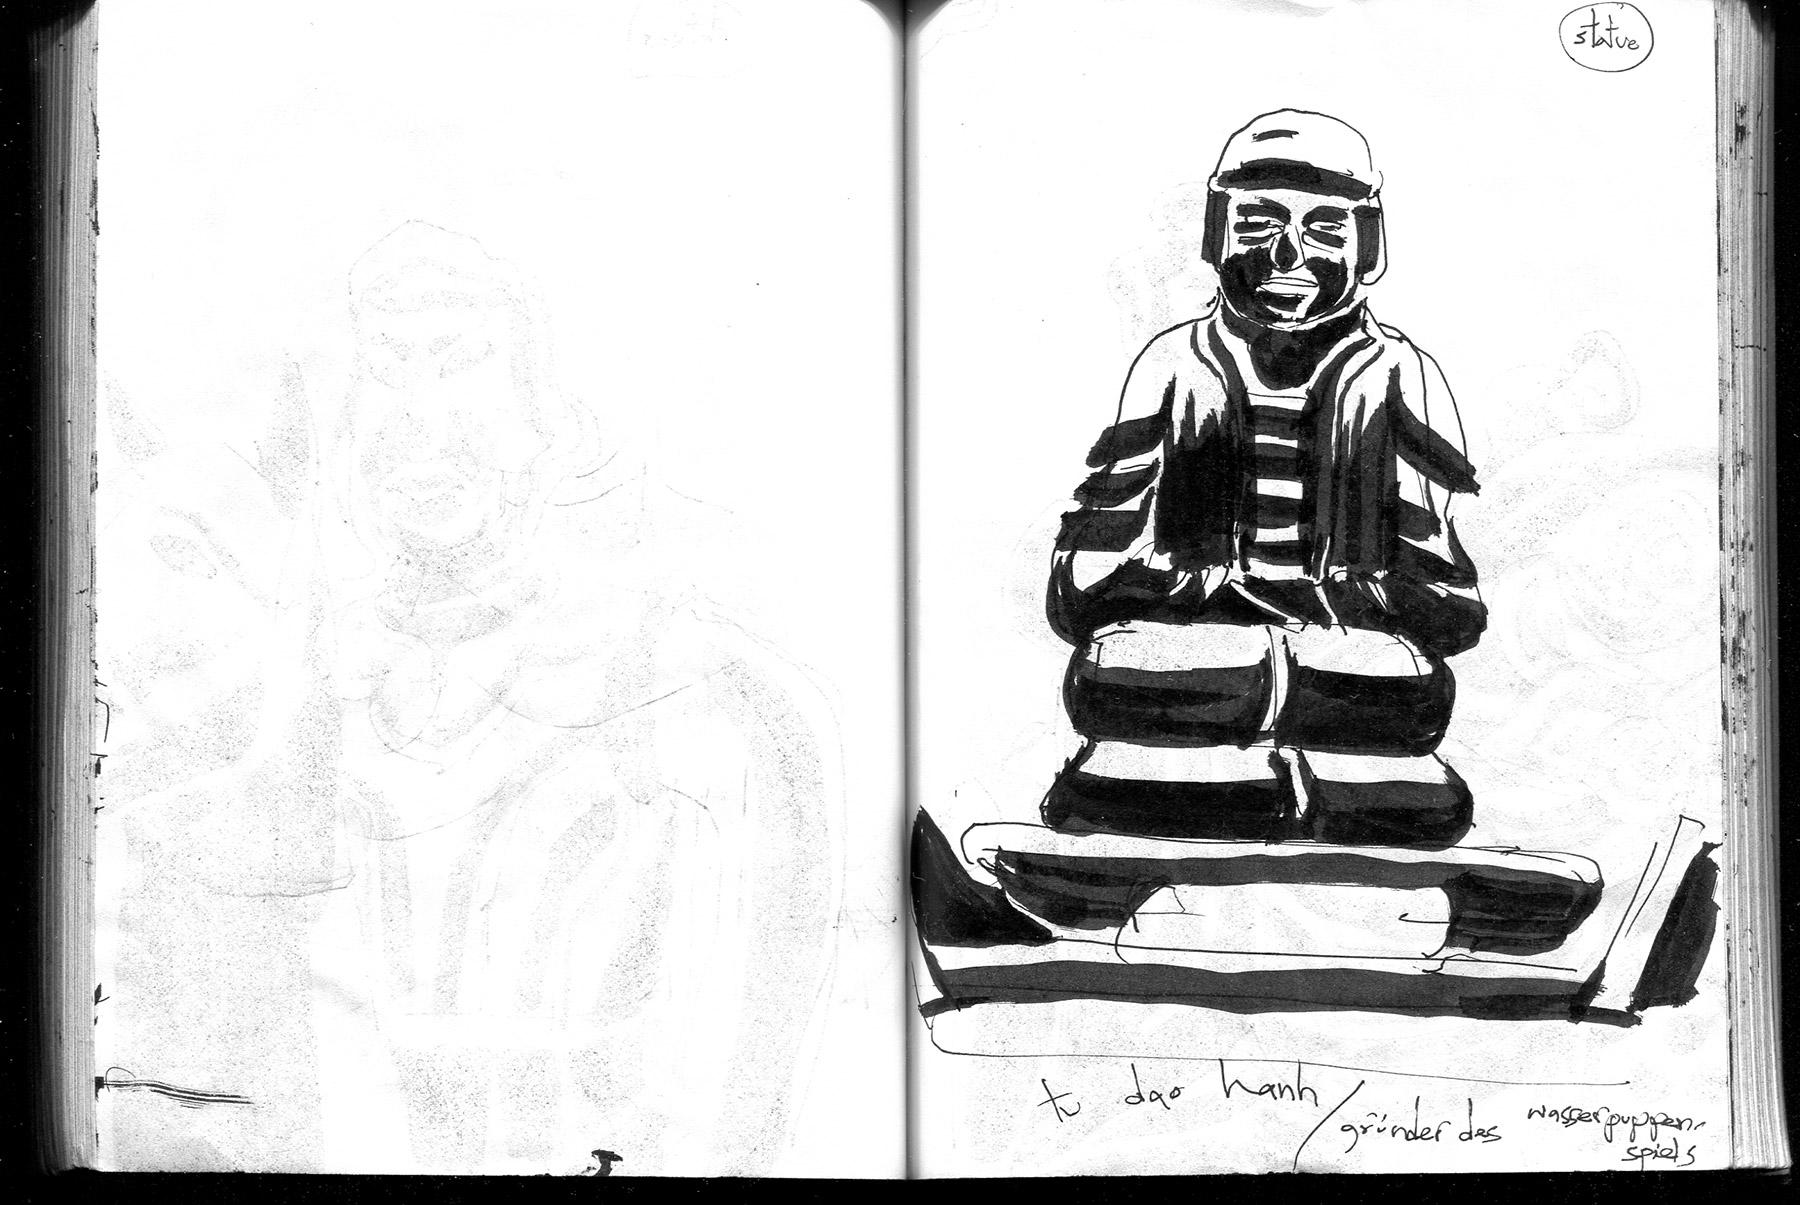 davidm_sketches_2014_08-110.jpg